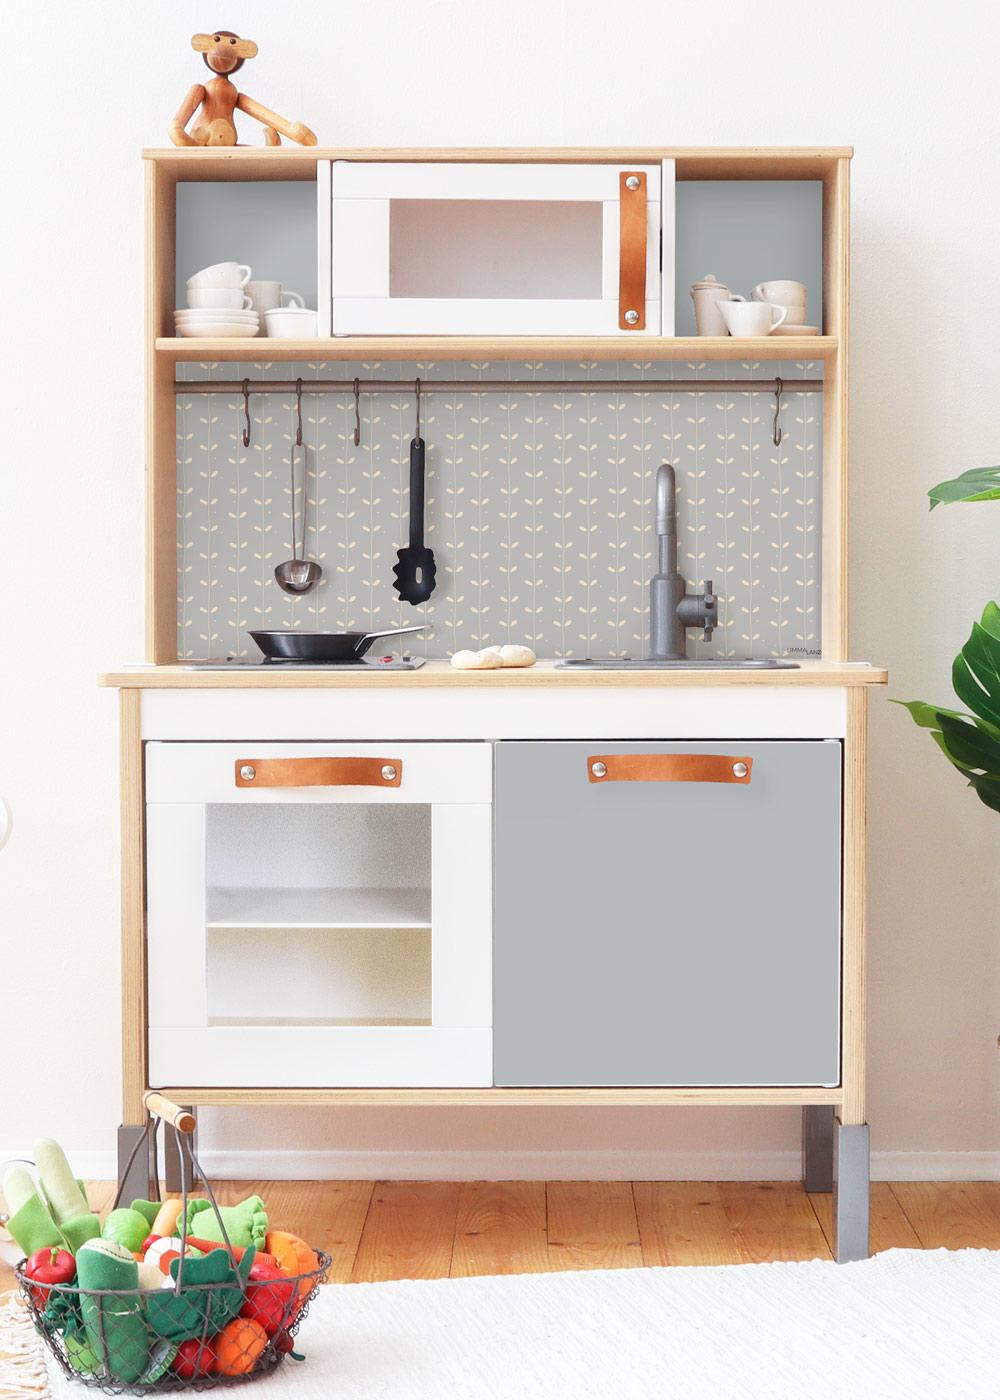 Ikea Duktig Kinderküche Natürlig Nordisch Blau